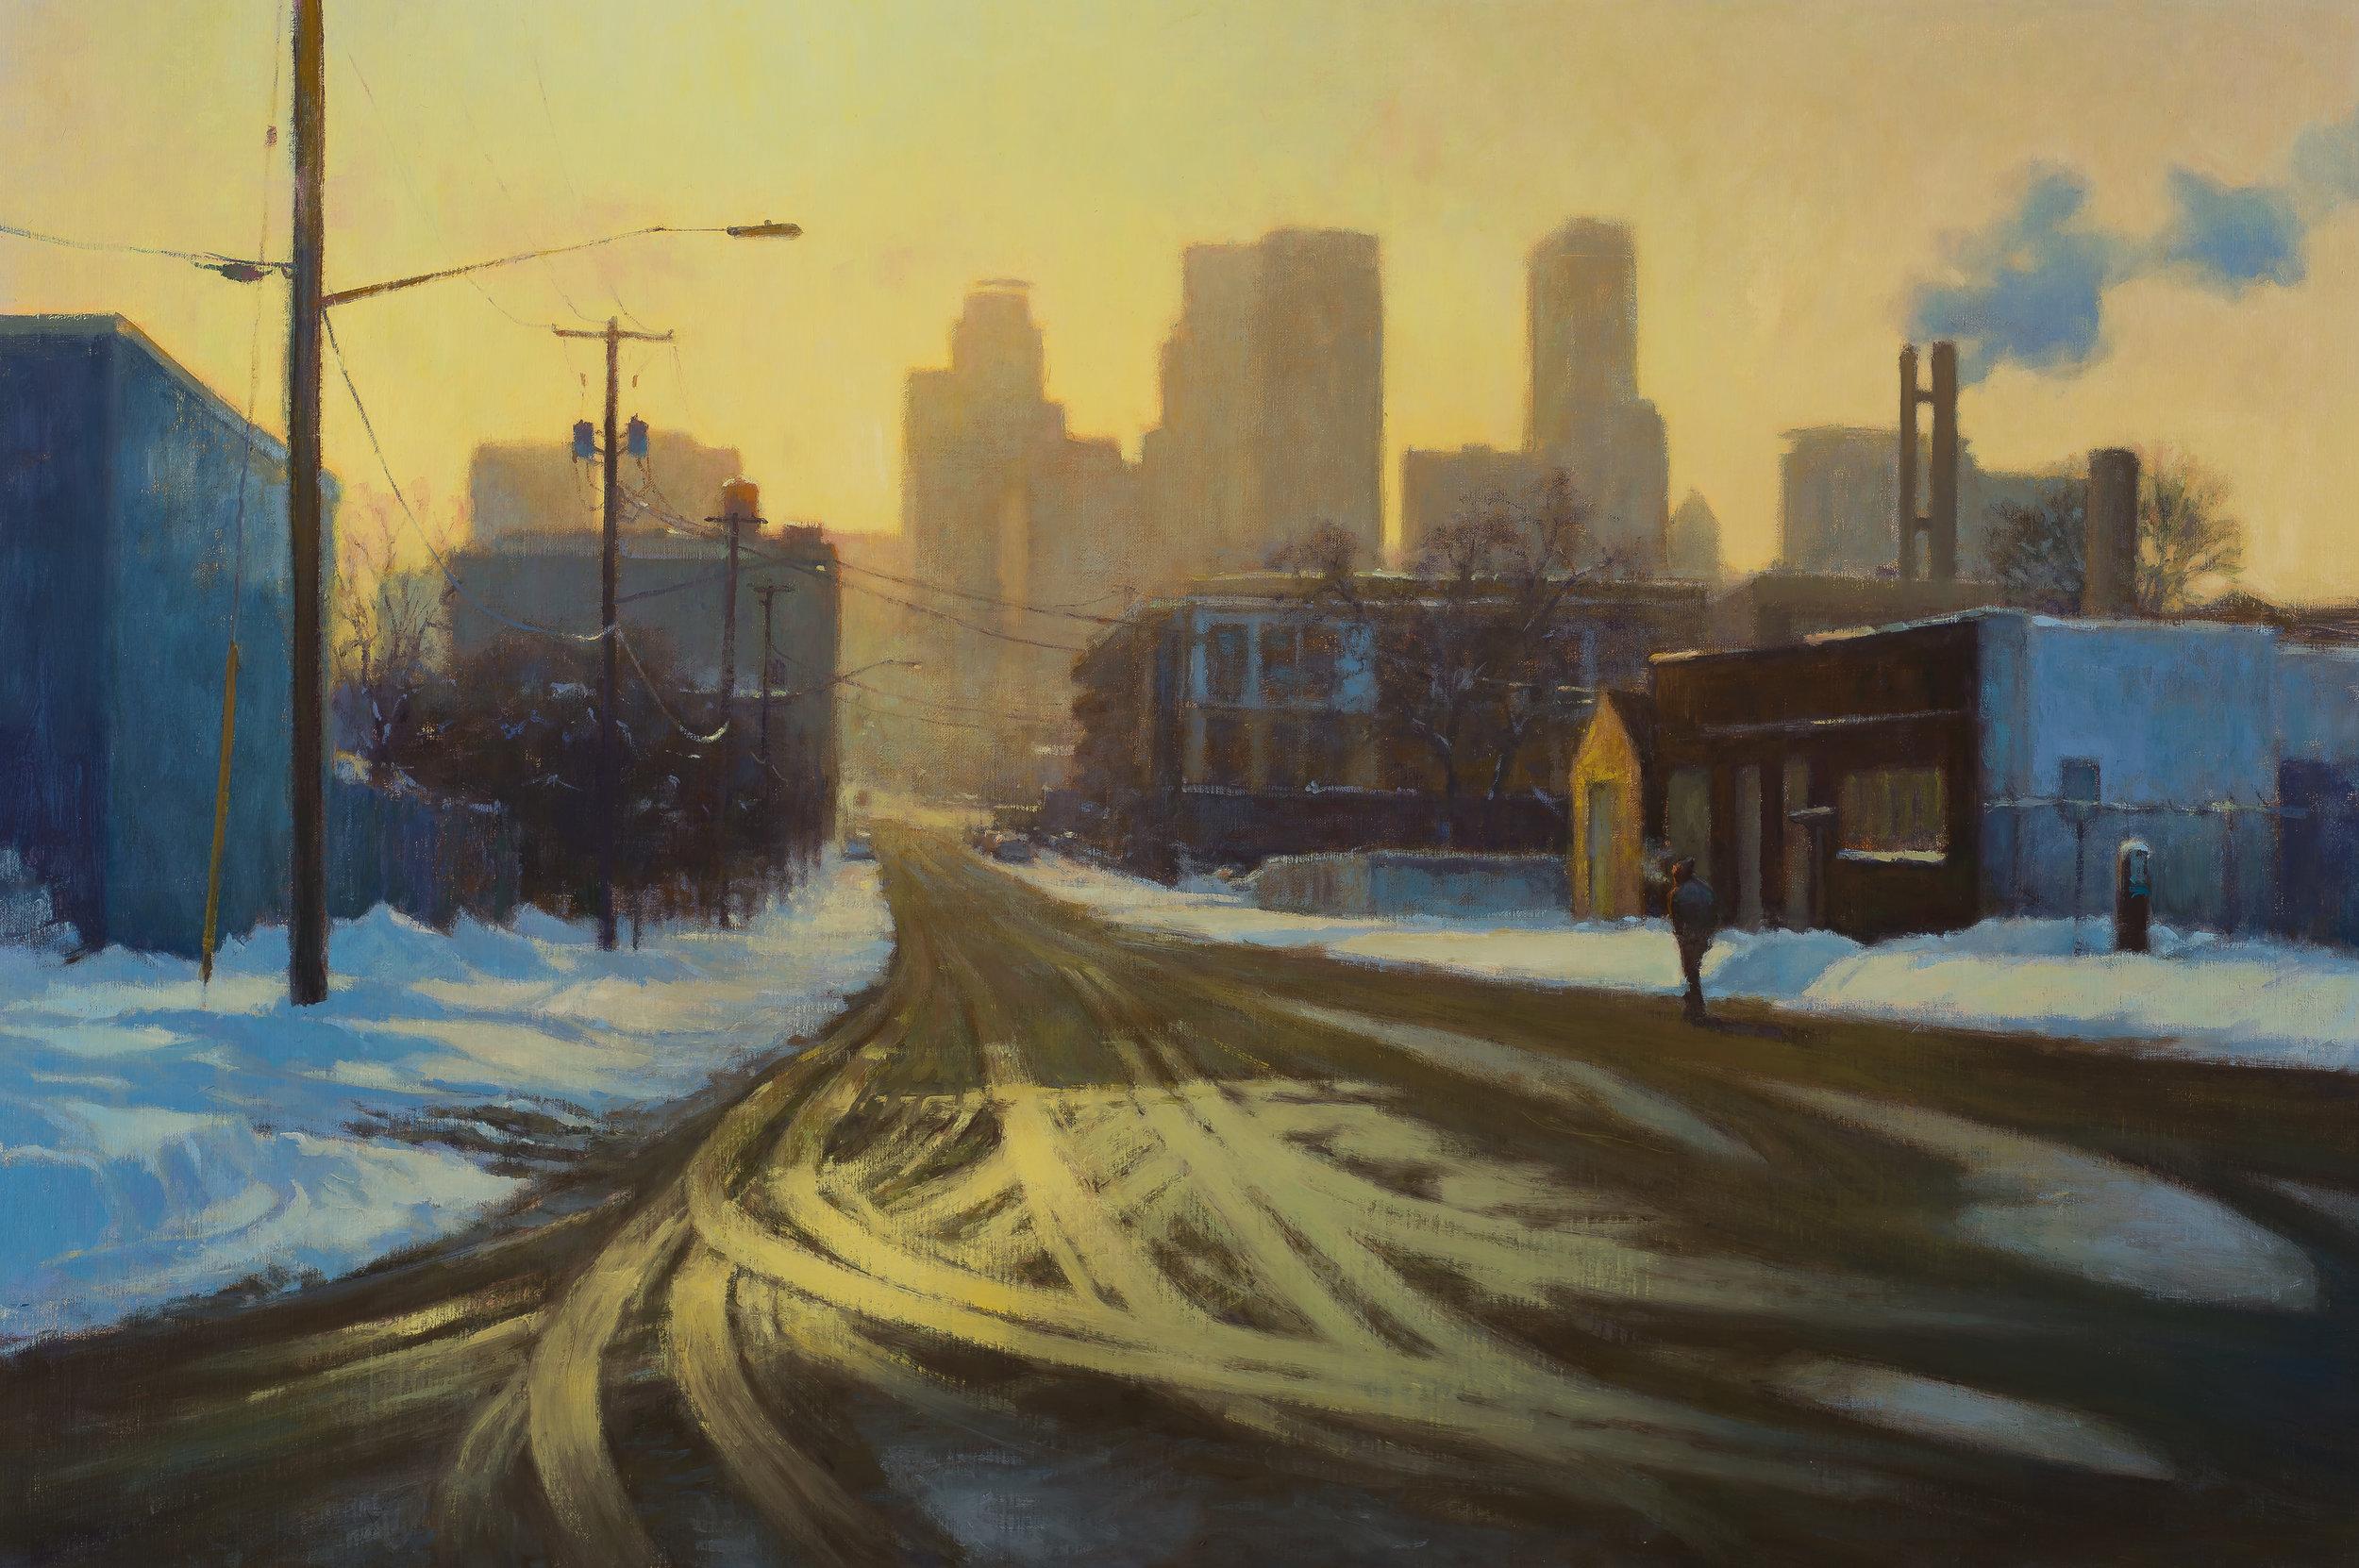 Winter-Warm-Light-24x36.jpg